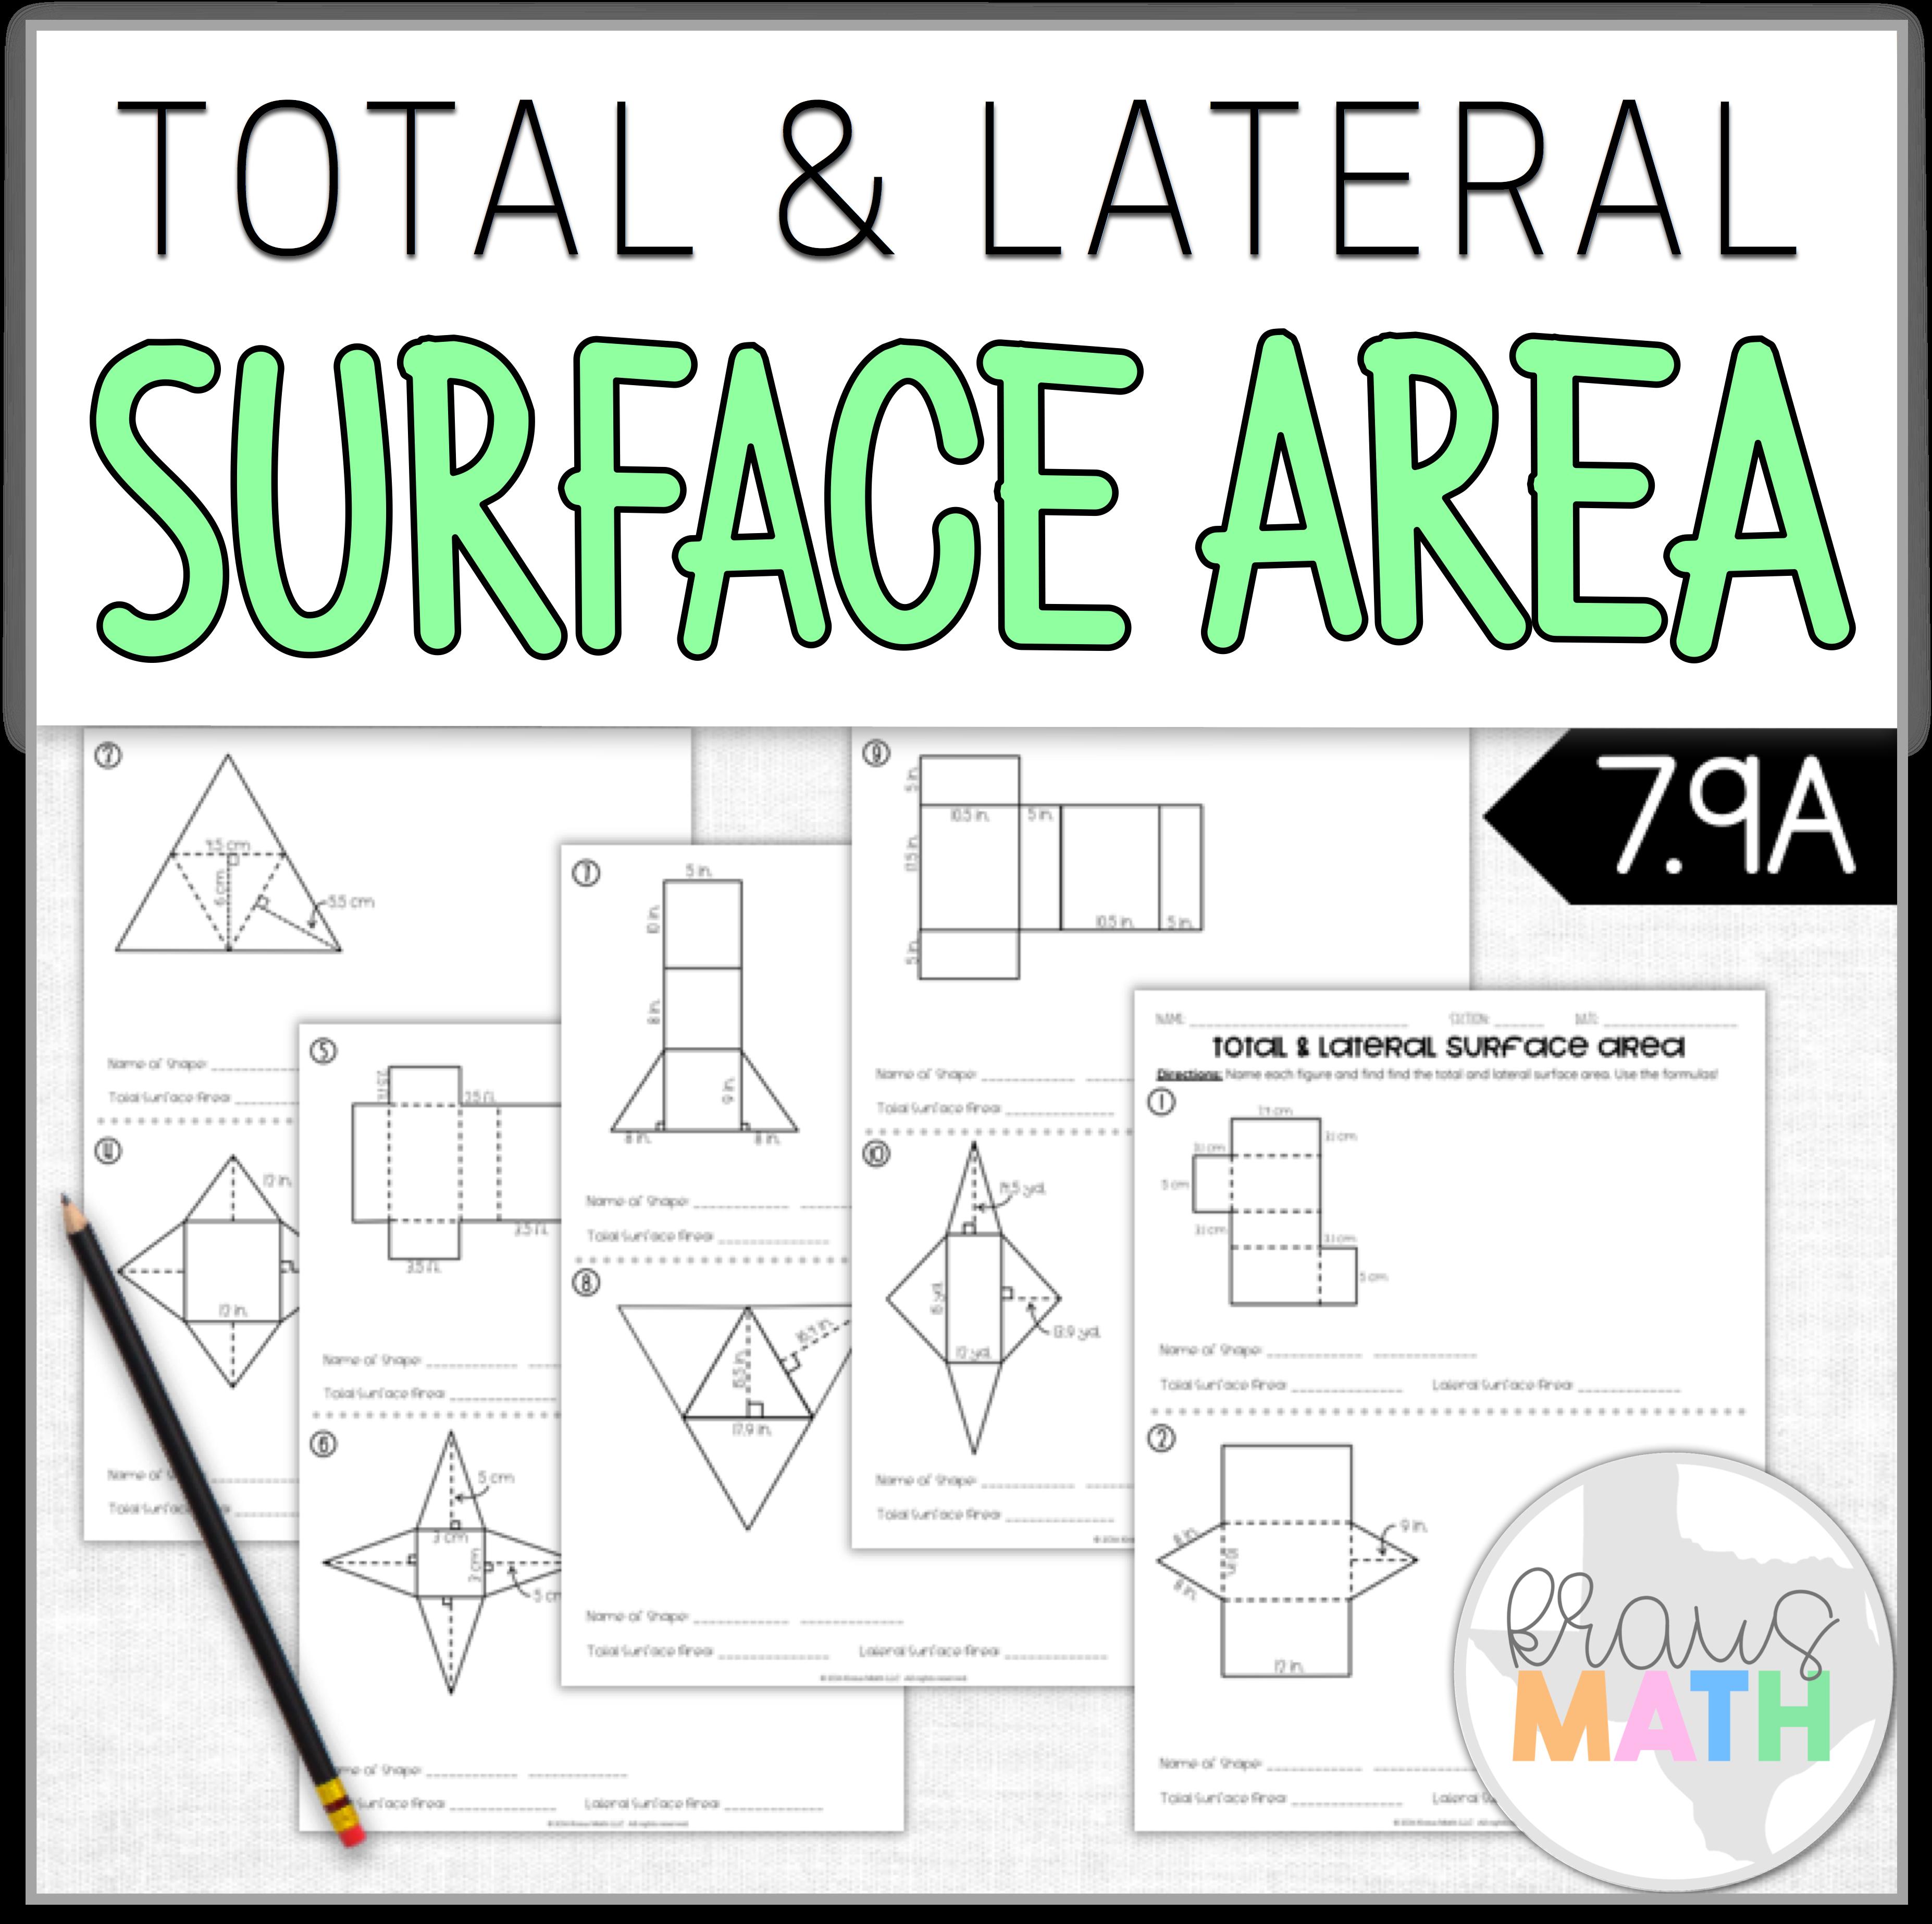 Surface Area Worksheet Teks 7 9d Kraus Math Area Worksheets Math Interactive Notebook Staar Review Math [ 3692 x 3708 Pixel ]